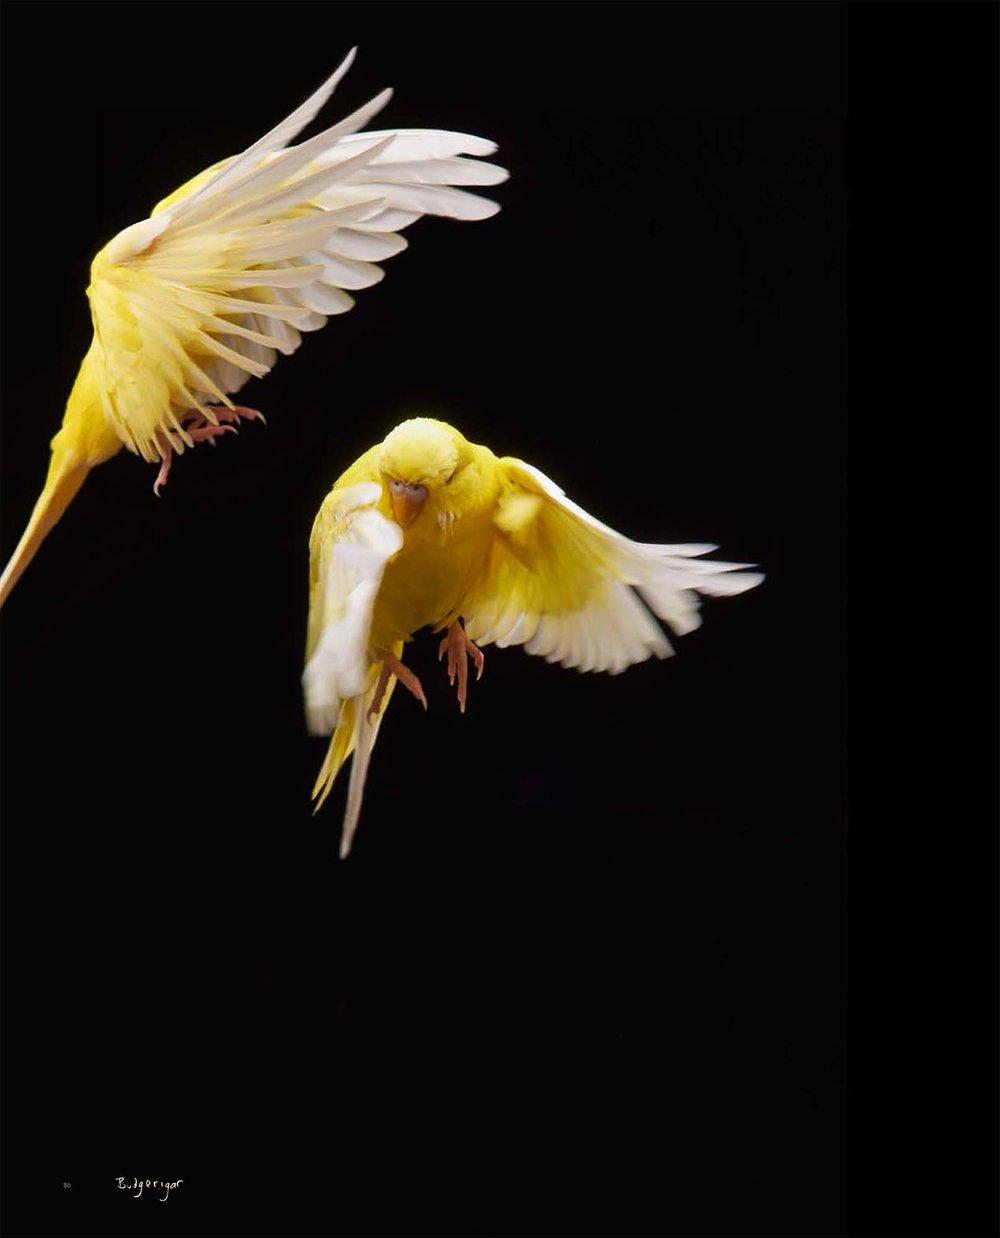 BIRD Gary Heery Book-completemmockup-82.jpg